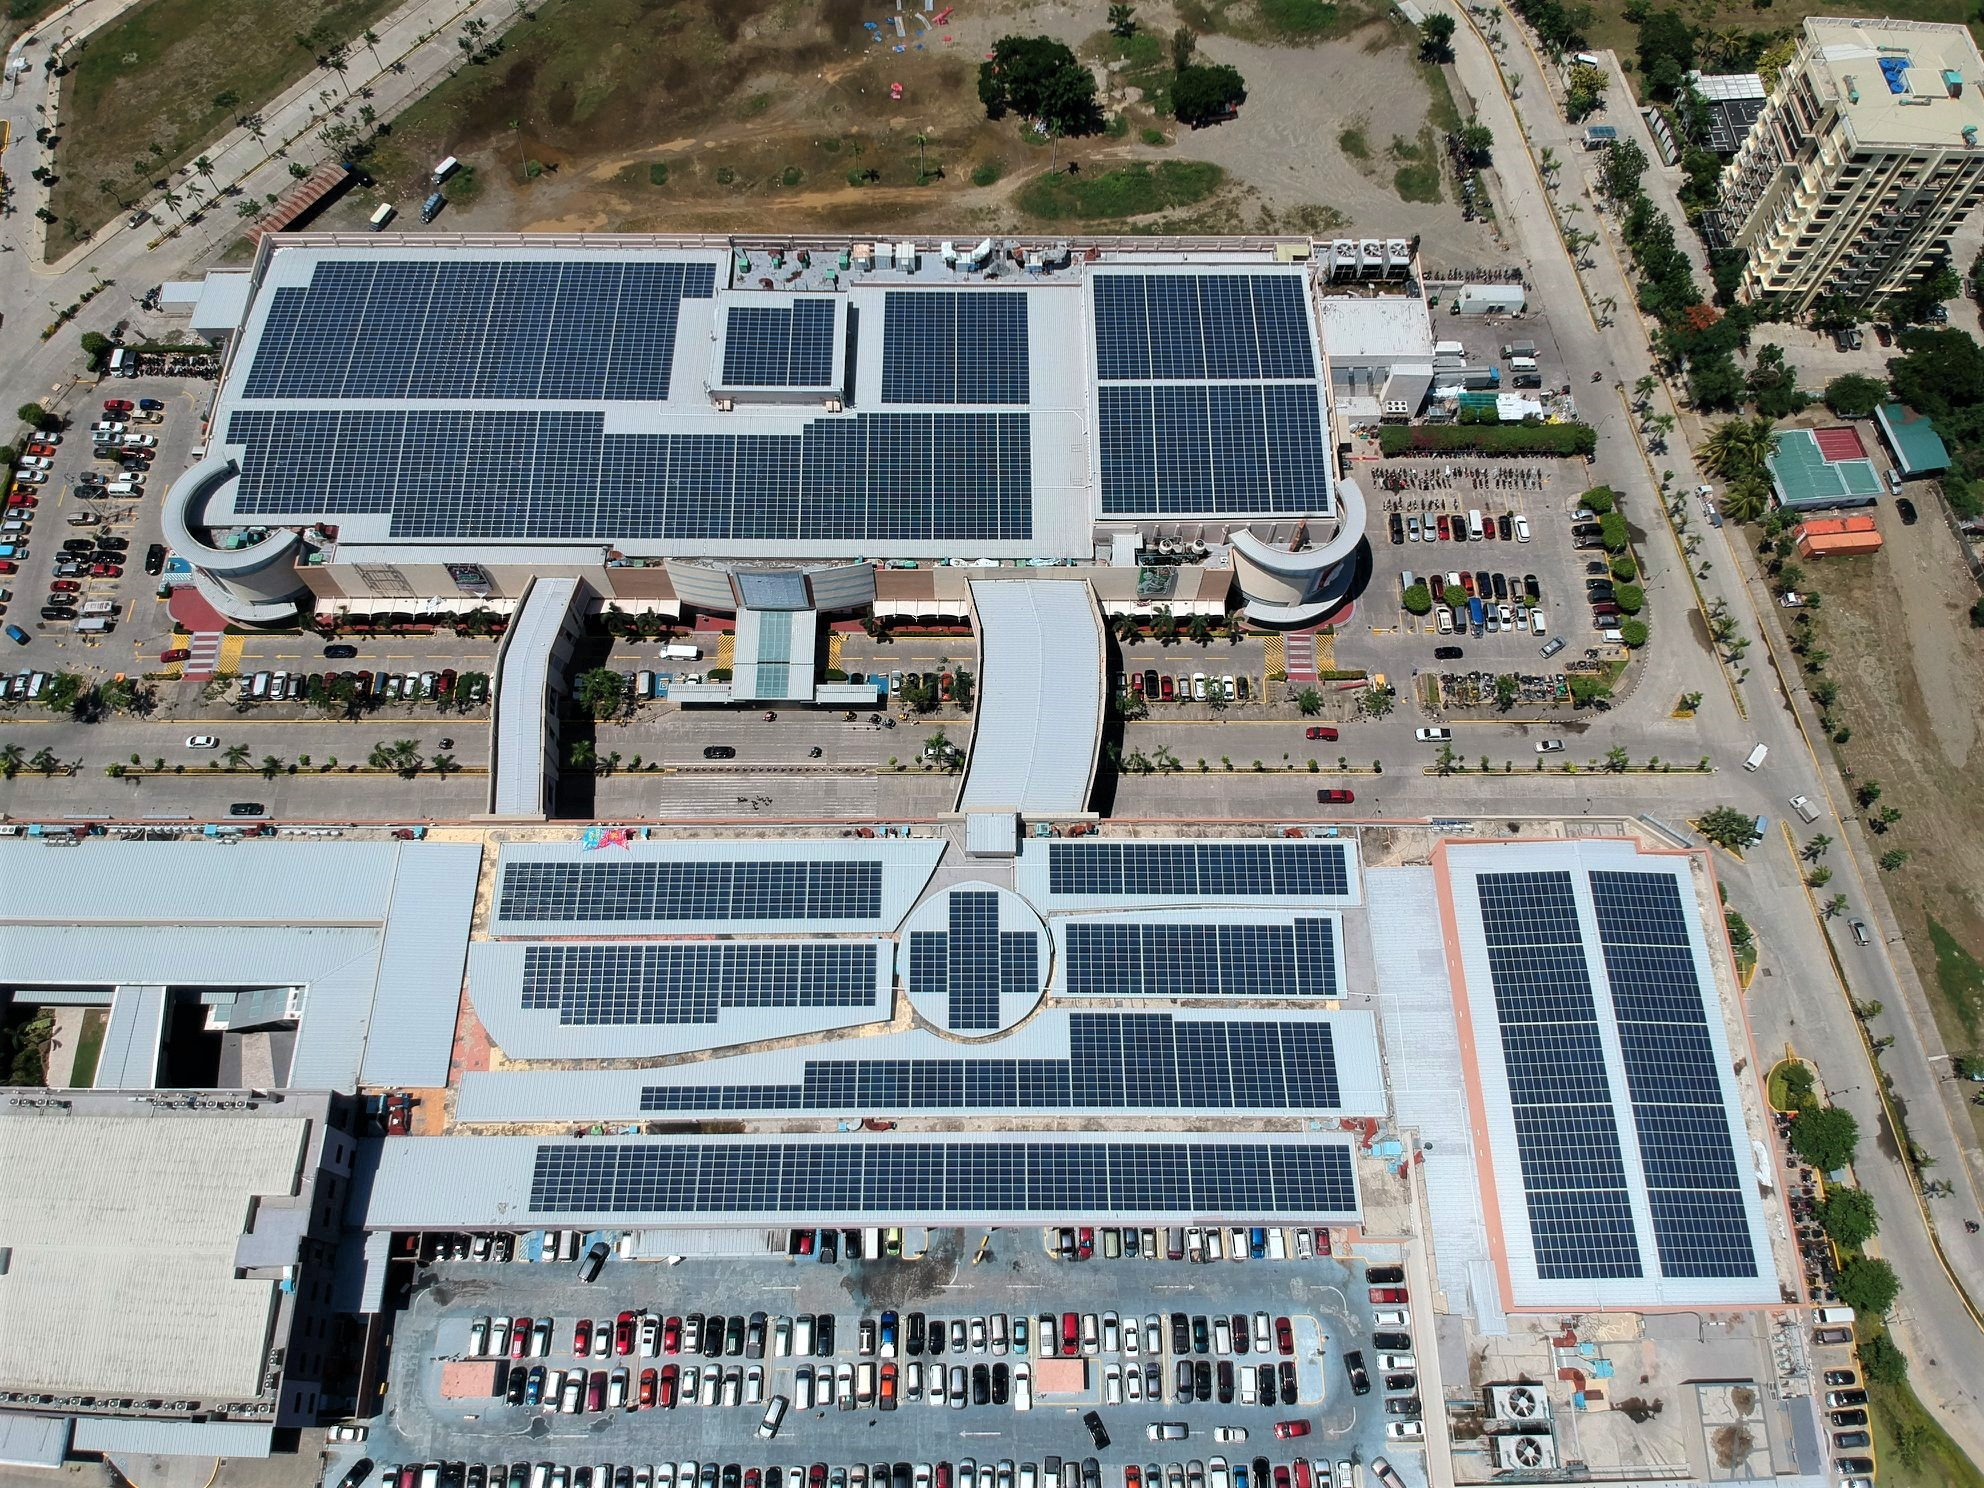 Robinsons Malls (Ilocos Main & Expansion)